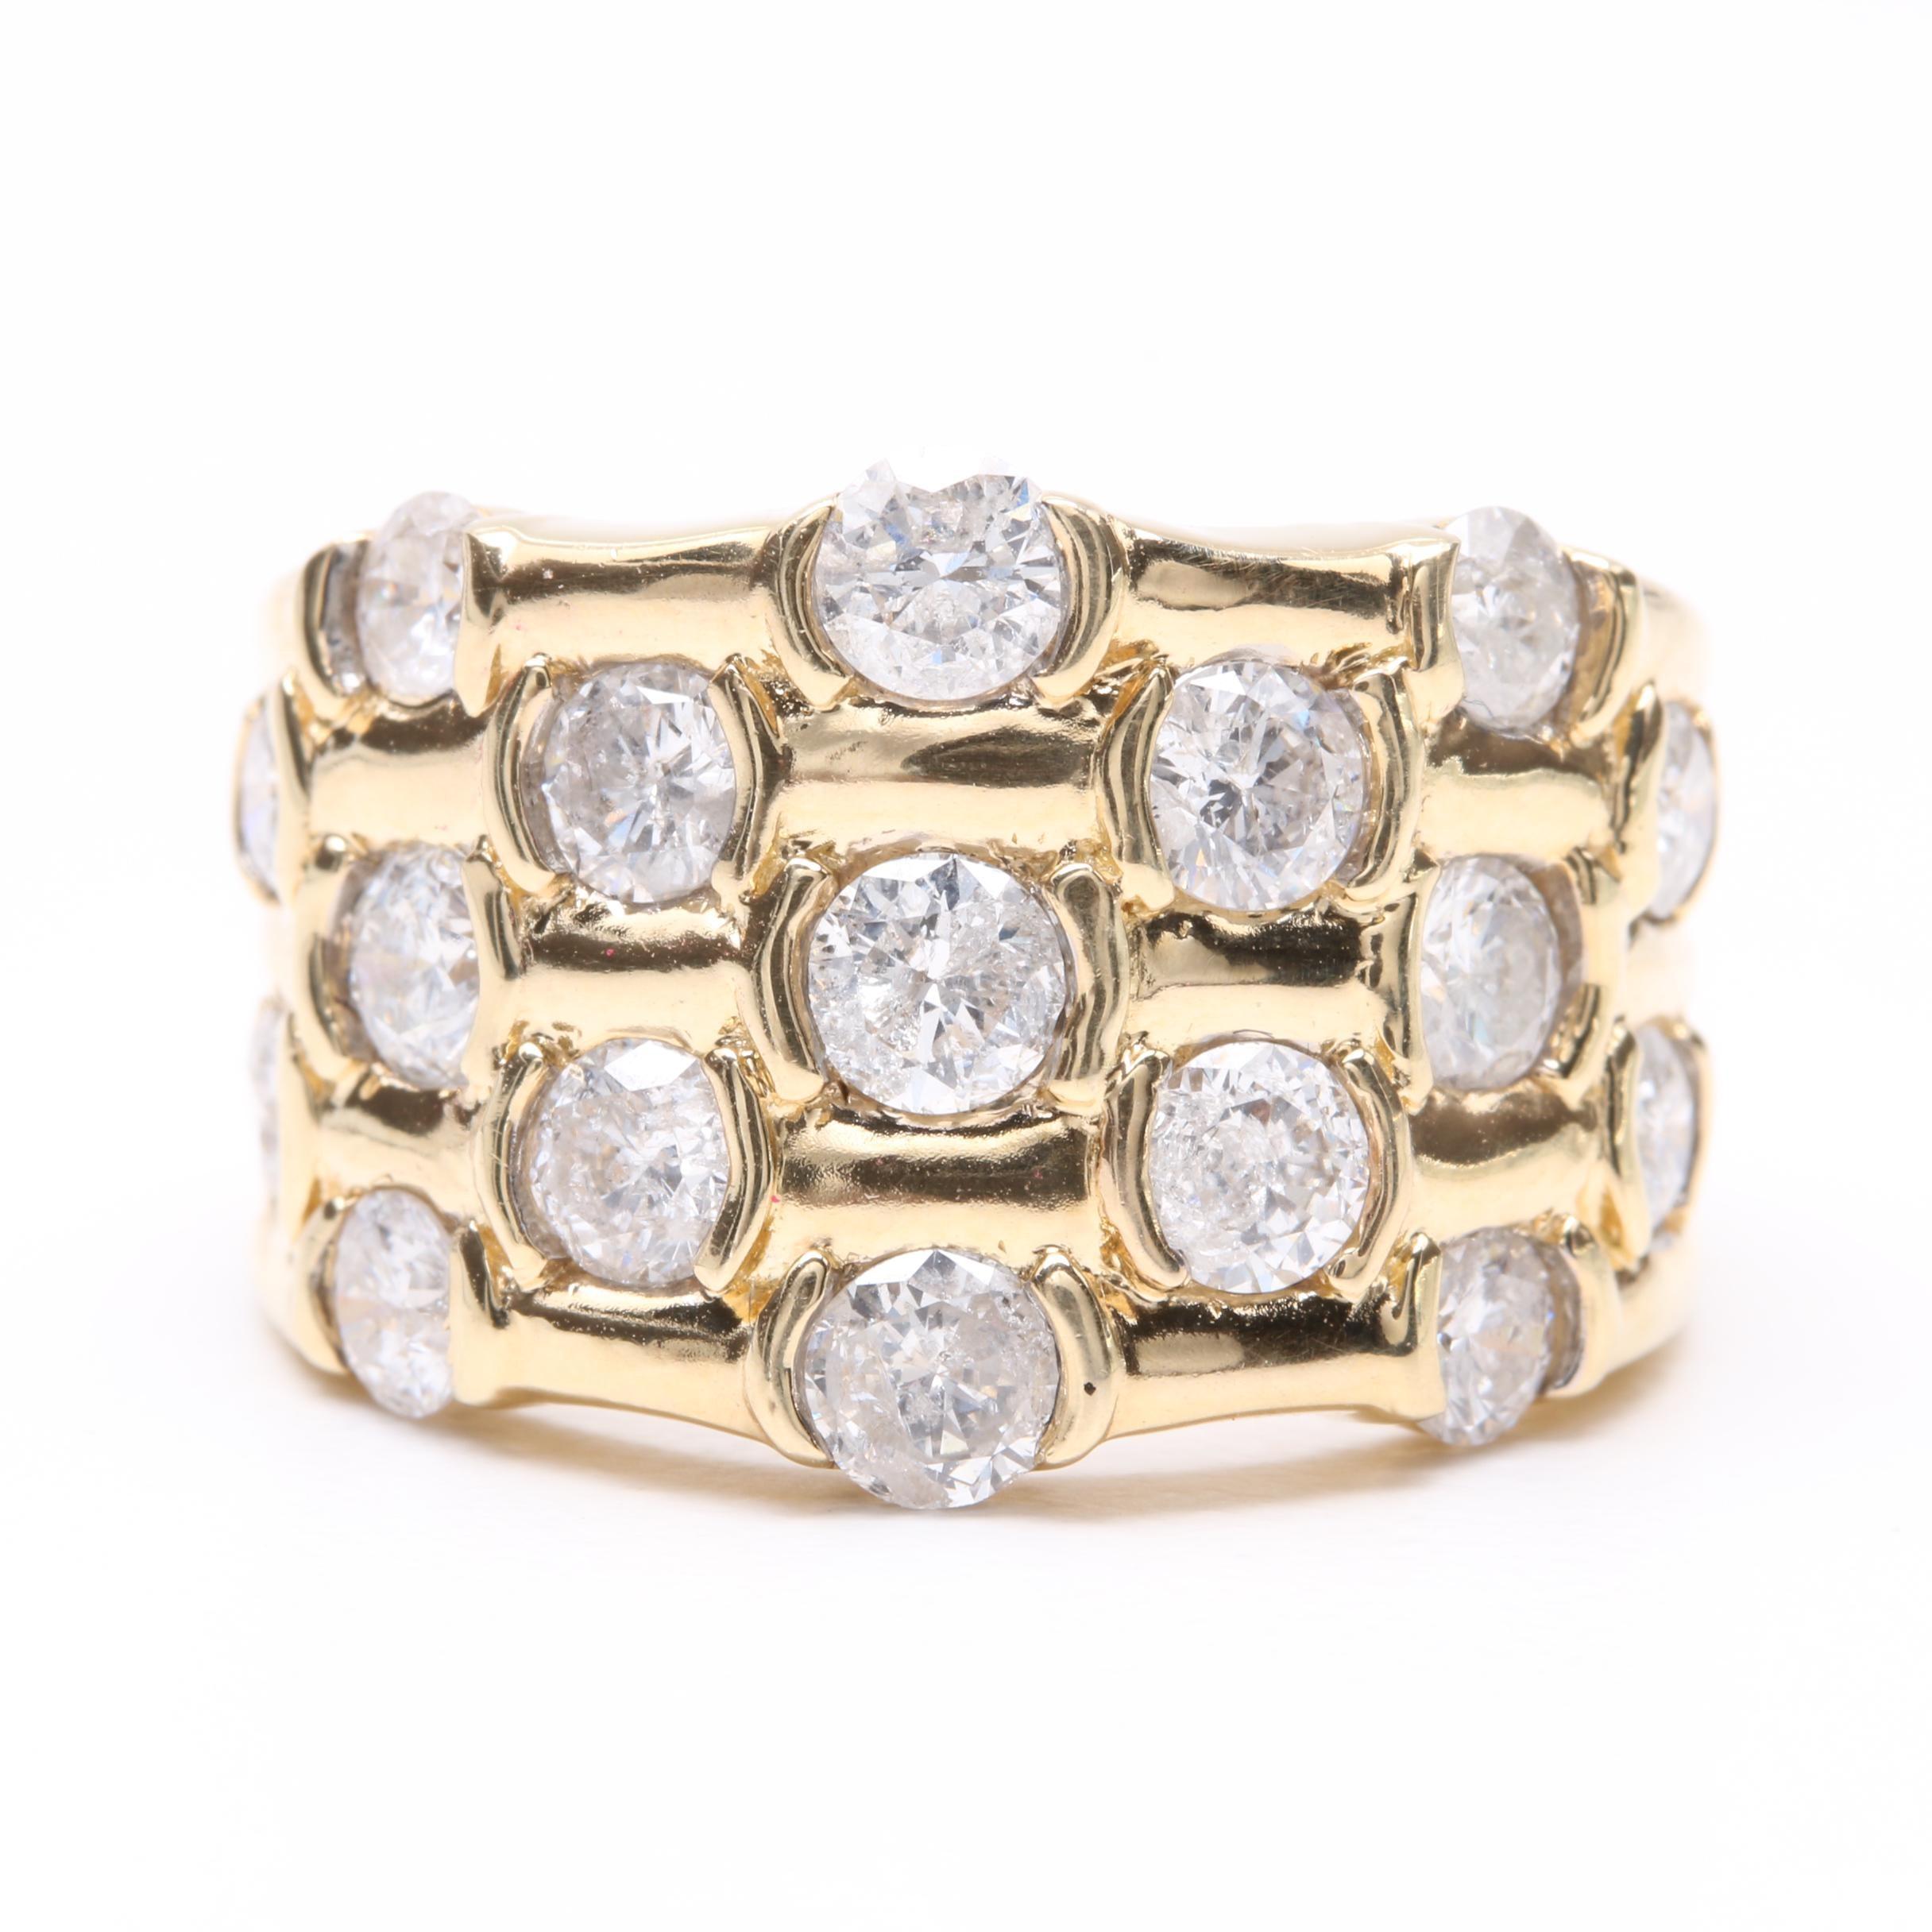 14K Yellow Gold 2.56 CTW Diamond Ring